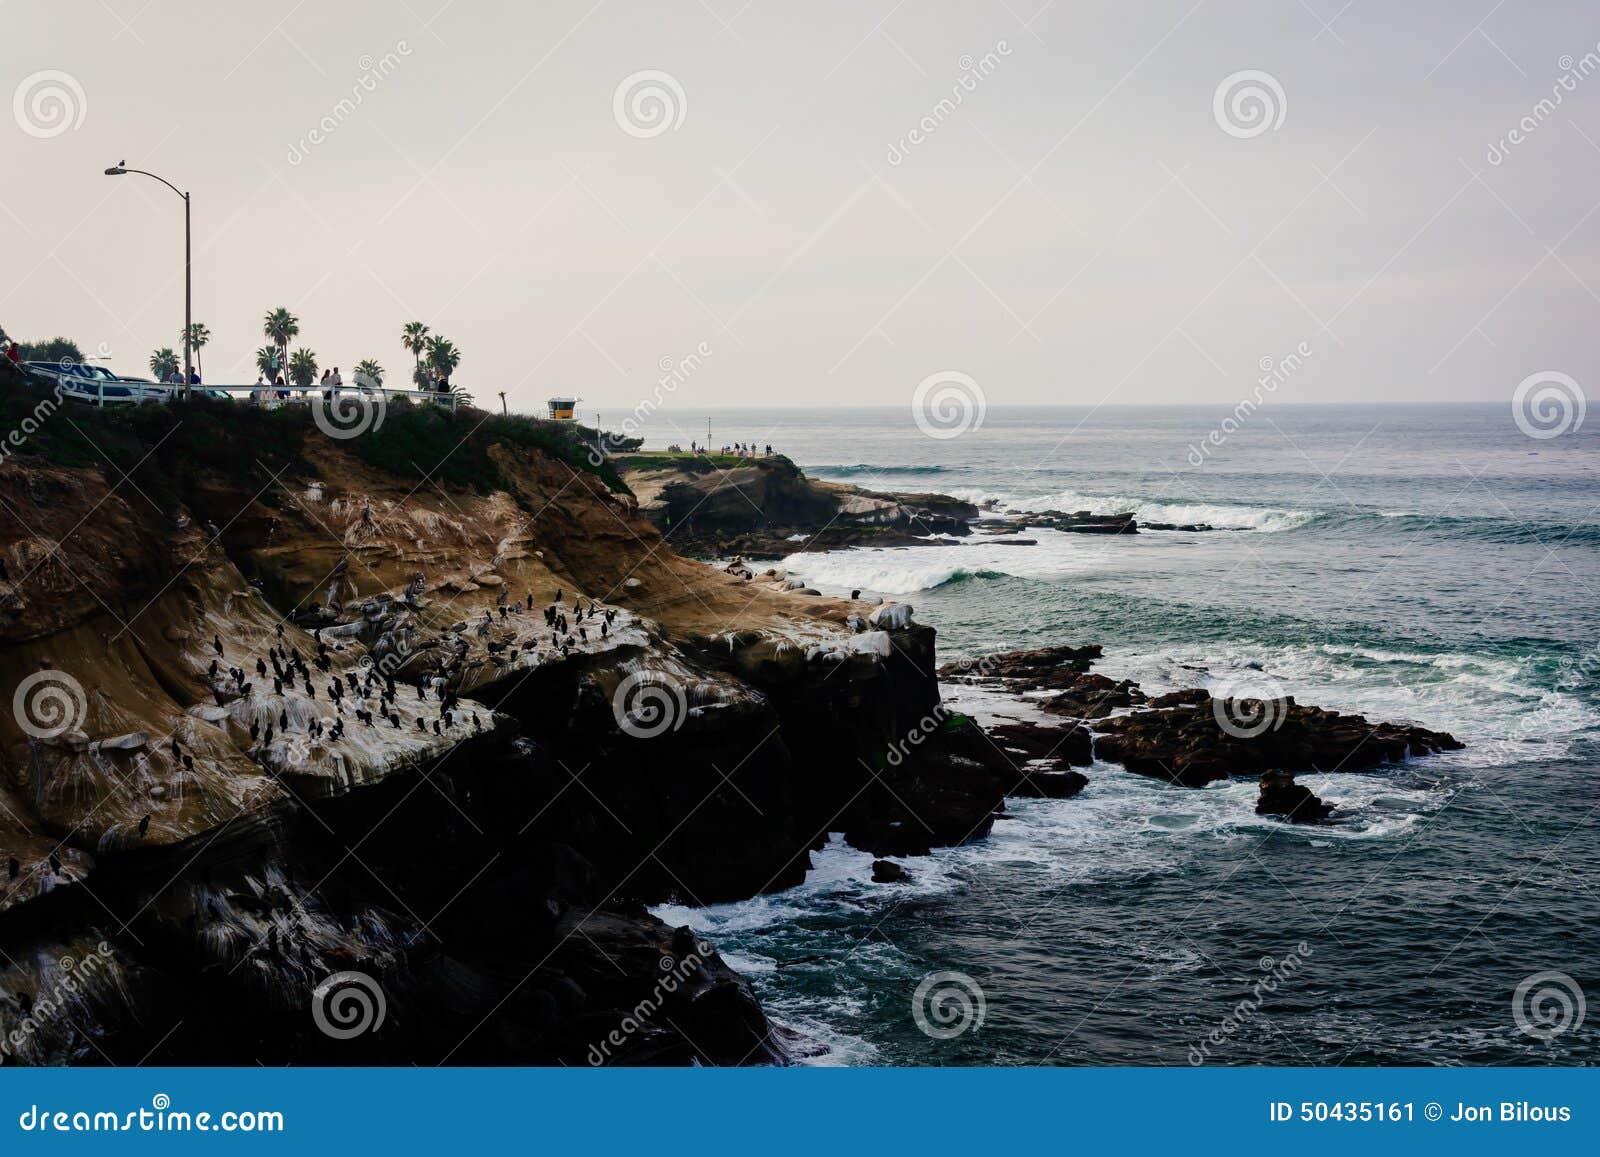 Waves crash on cliffs along the Pacific Ocean in La Jolla, Calif